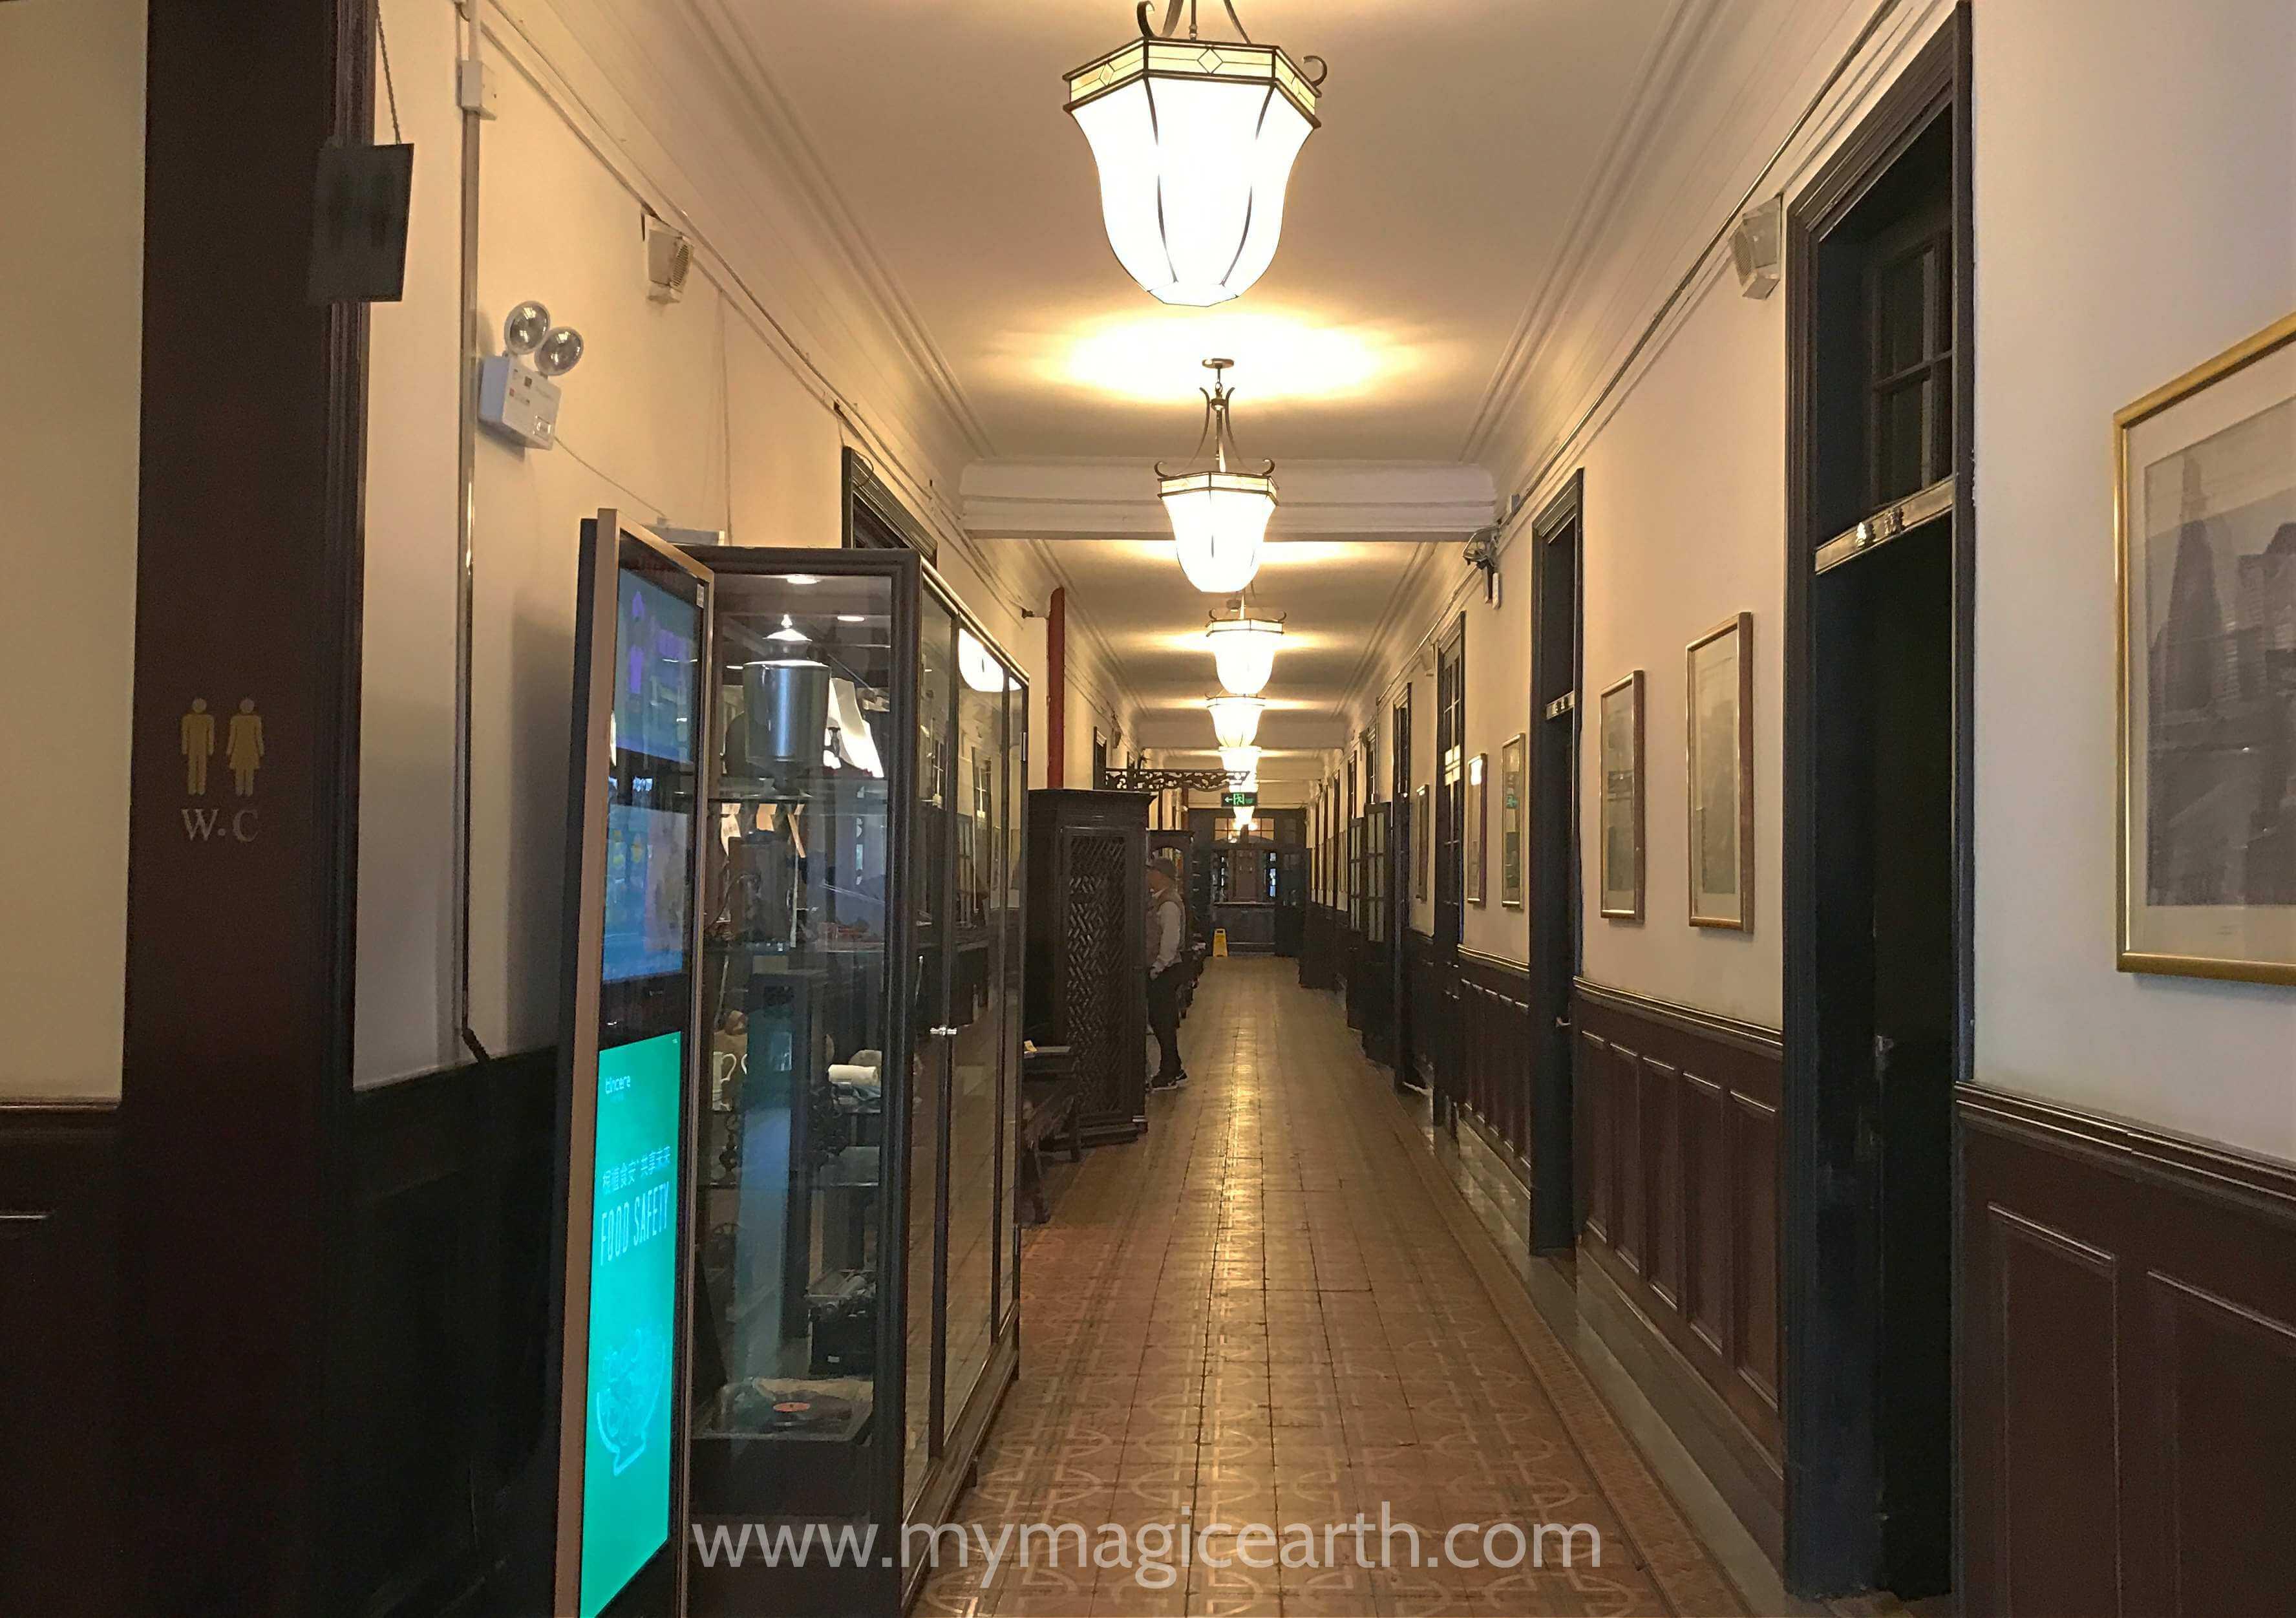 The long hall on the ground floor of the Old Shanghai Restaurant (老上海餐厅)